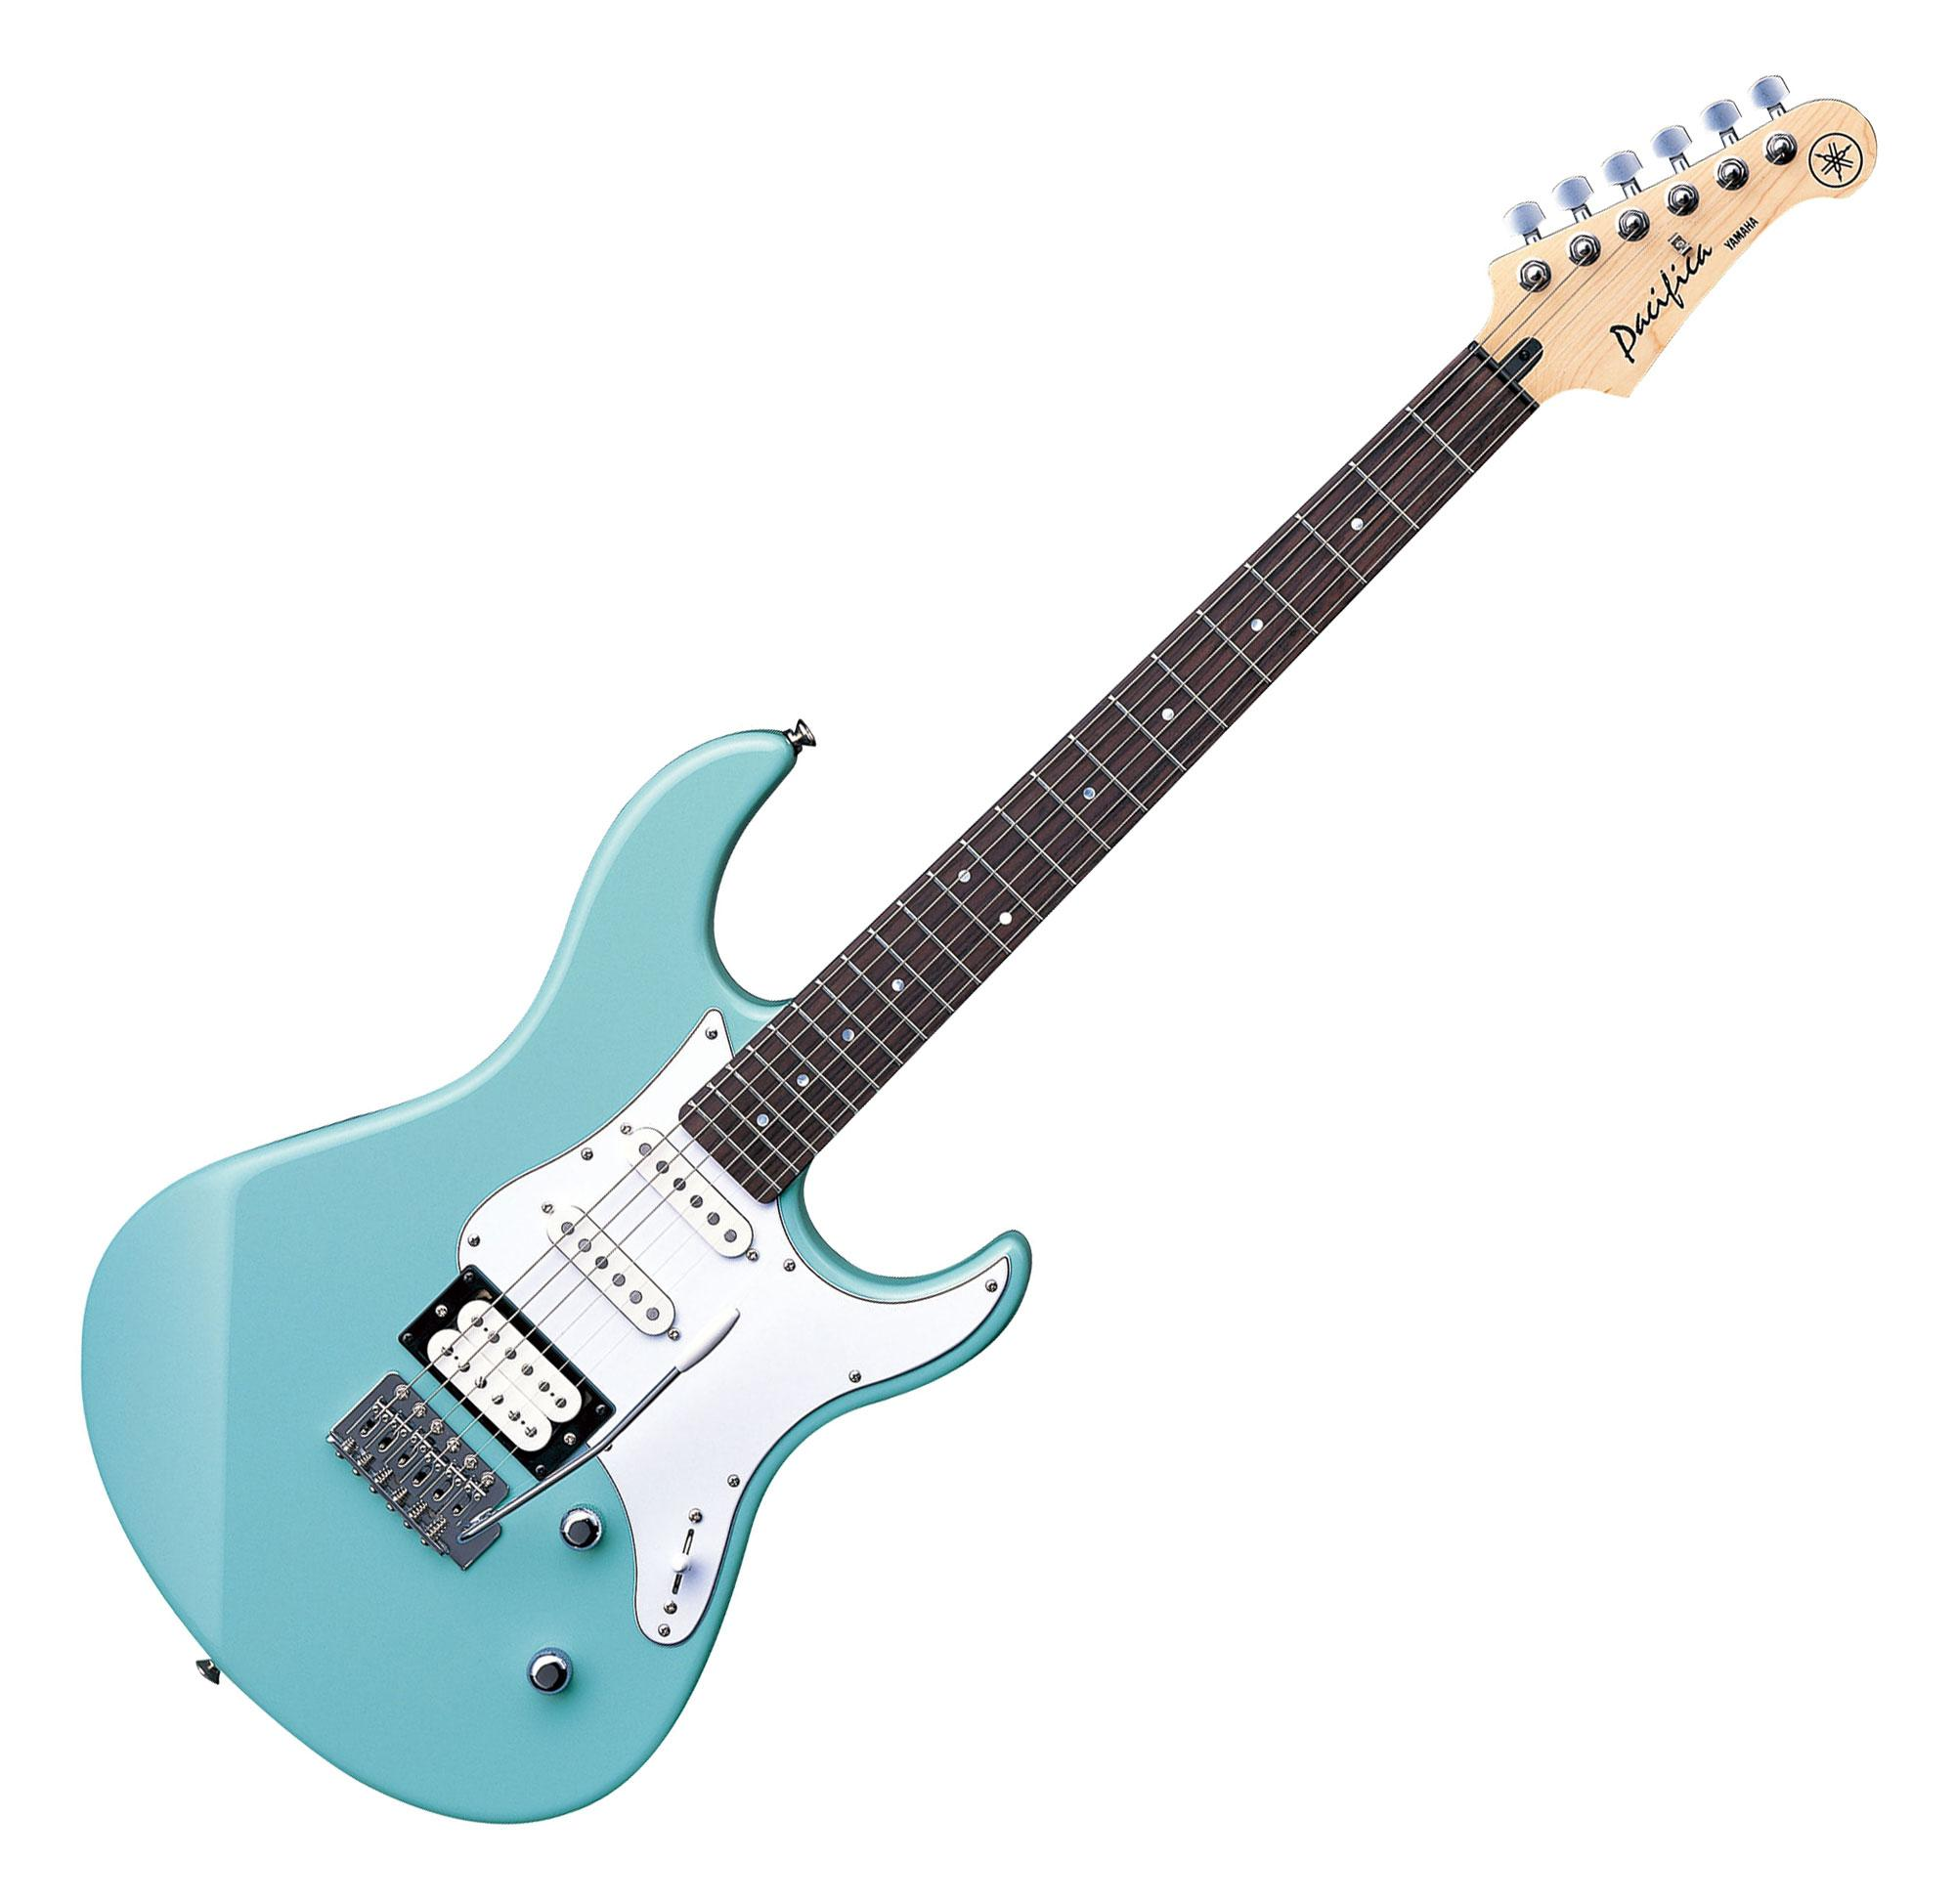 yamaha pacifica 112v e gitarre sonic blue kirstein music. Black Bedroom Furniture Sets. Home Design Ideas